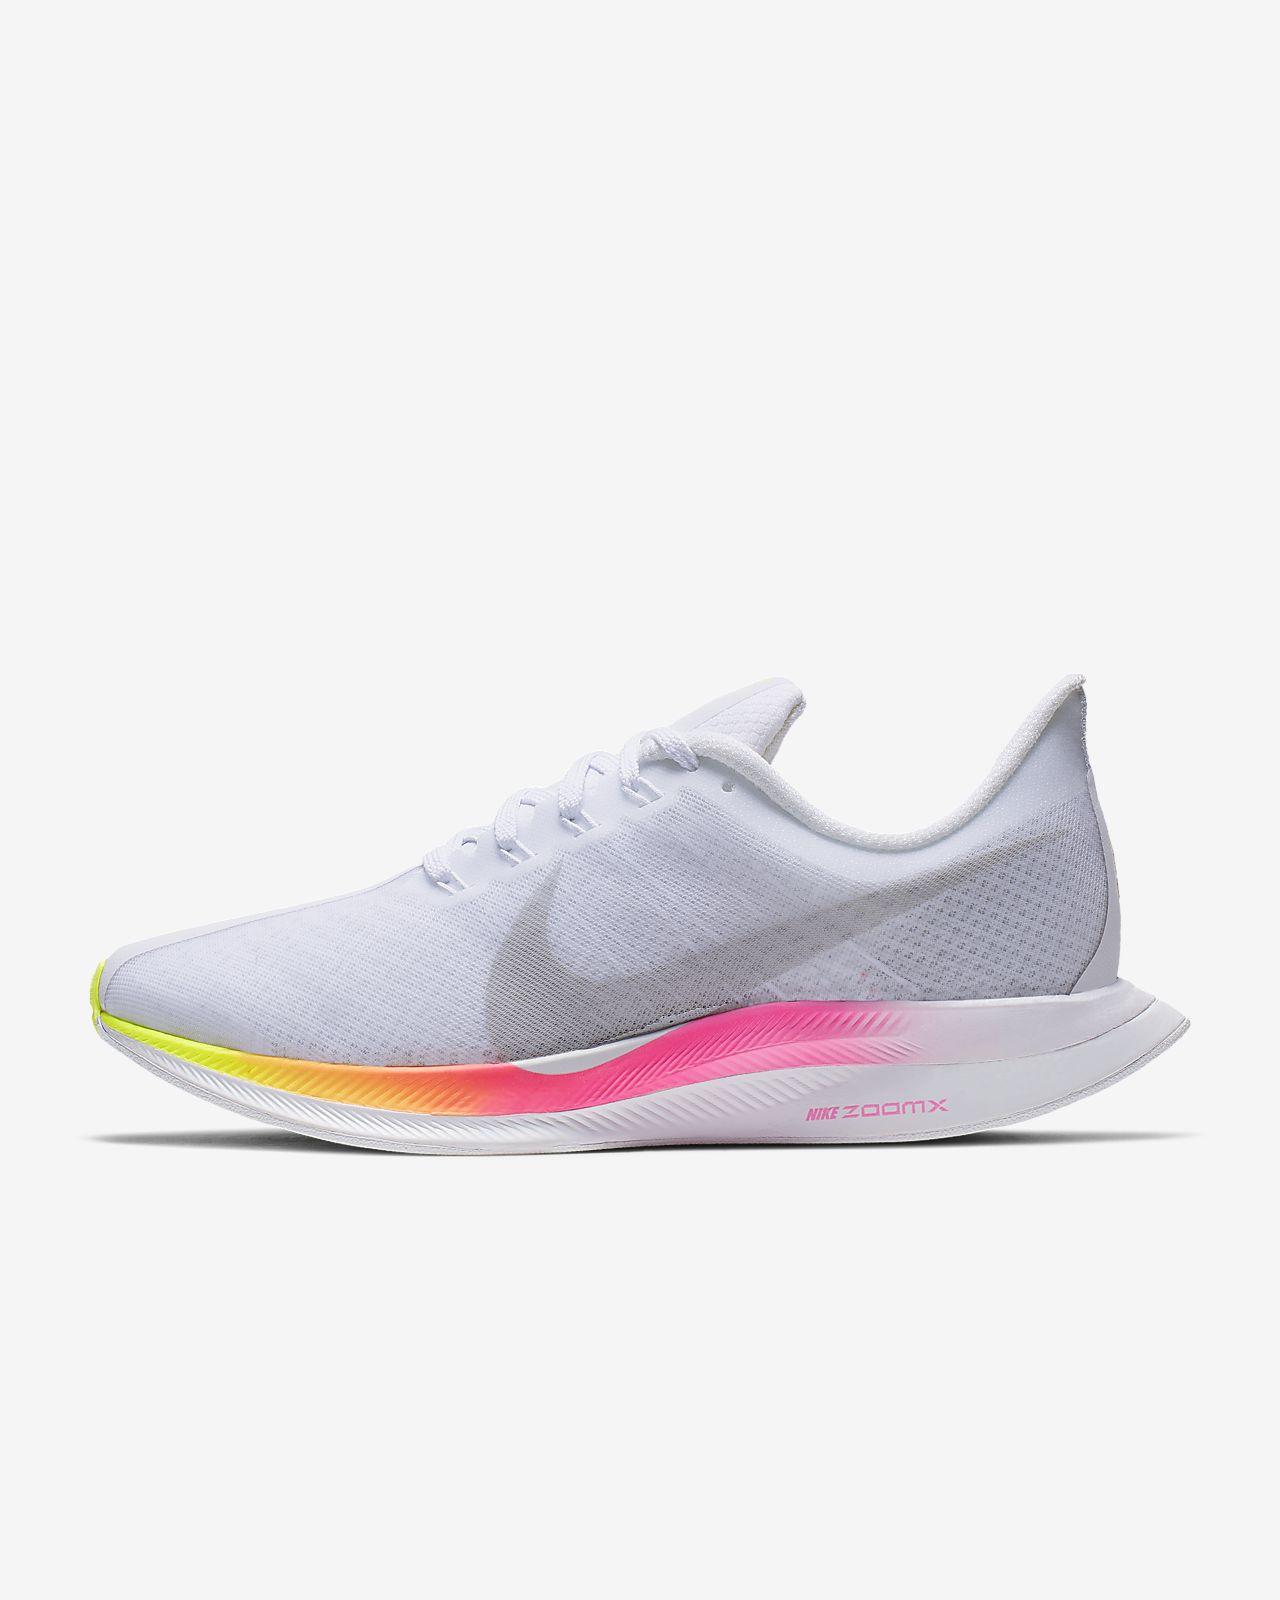 Sapatilhas de running Nike Zoom Pegasus 35 Turbo para mulher